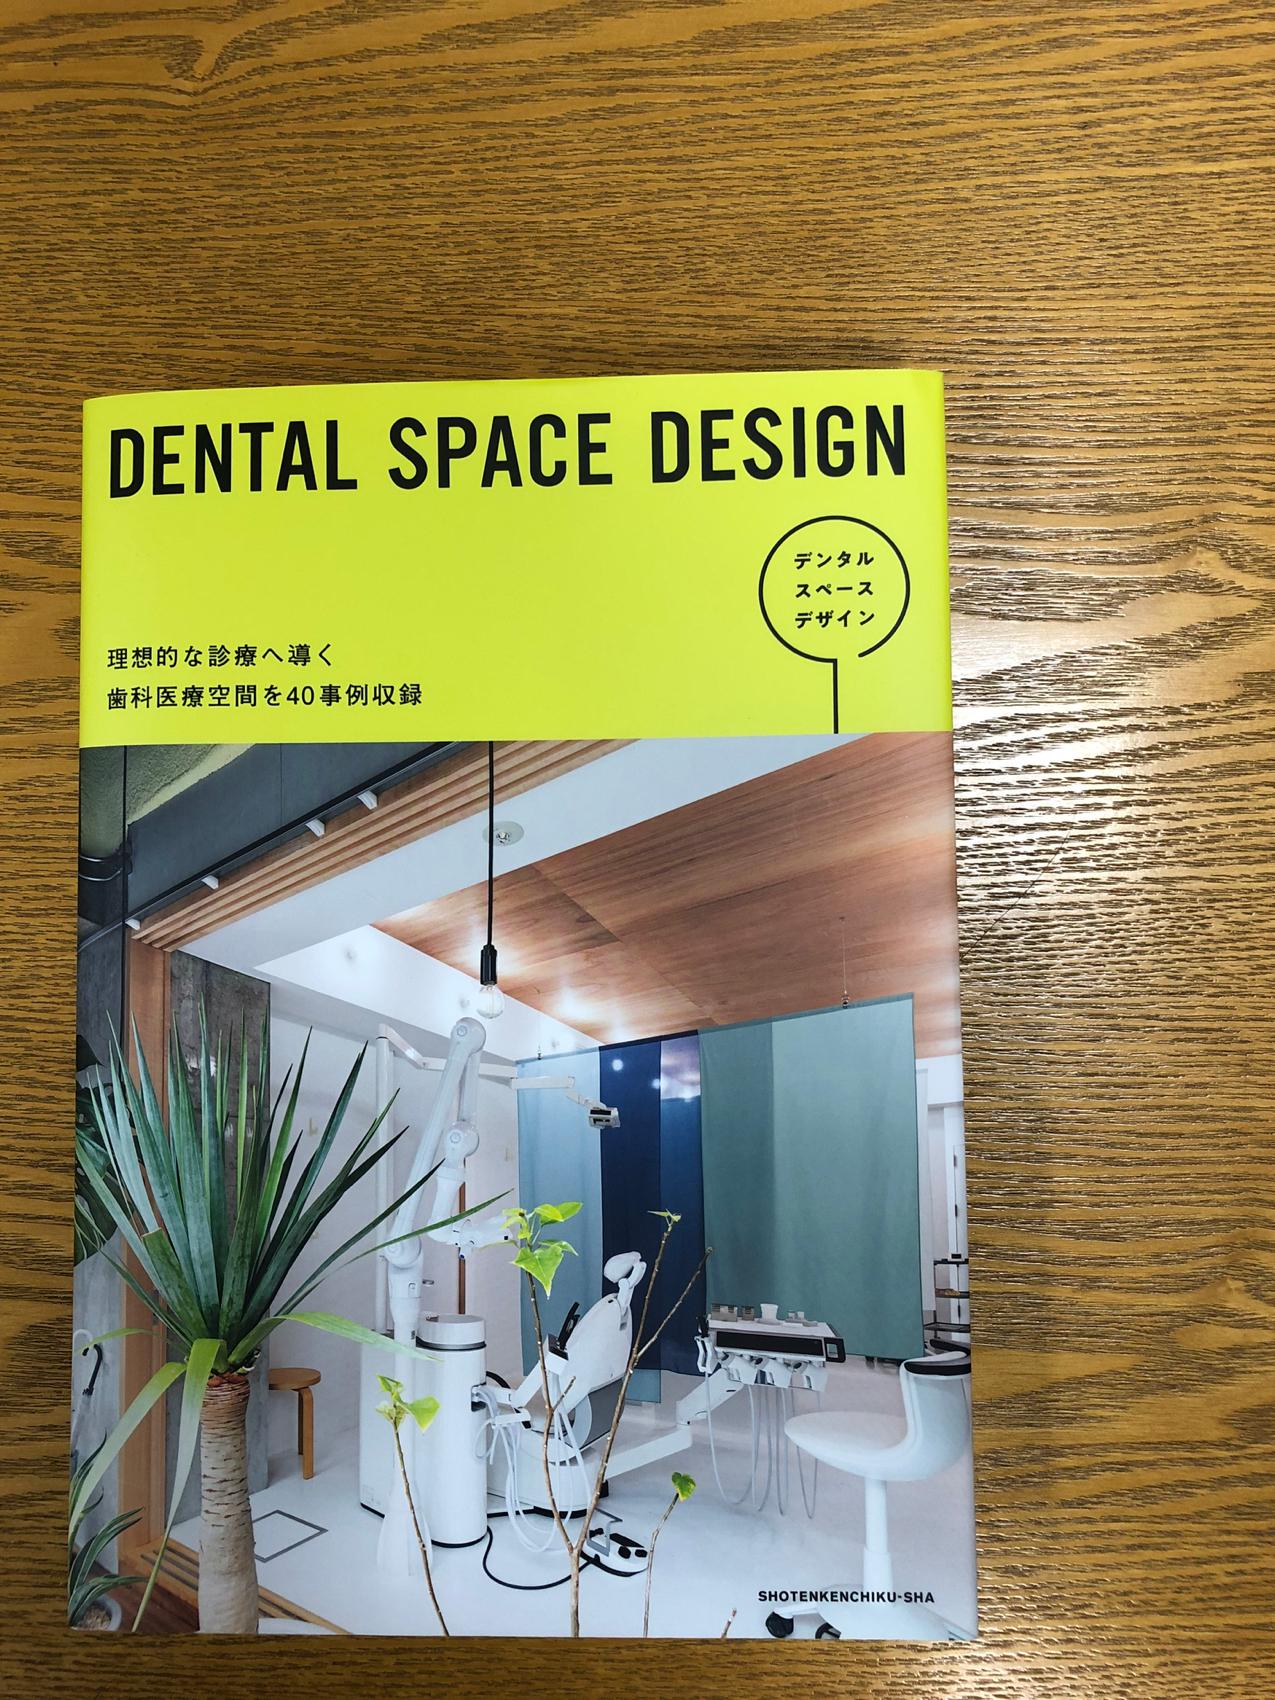 「DENTAL SPACE DESIGN」に「つつい歯科」を掲載頂きました。